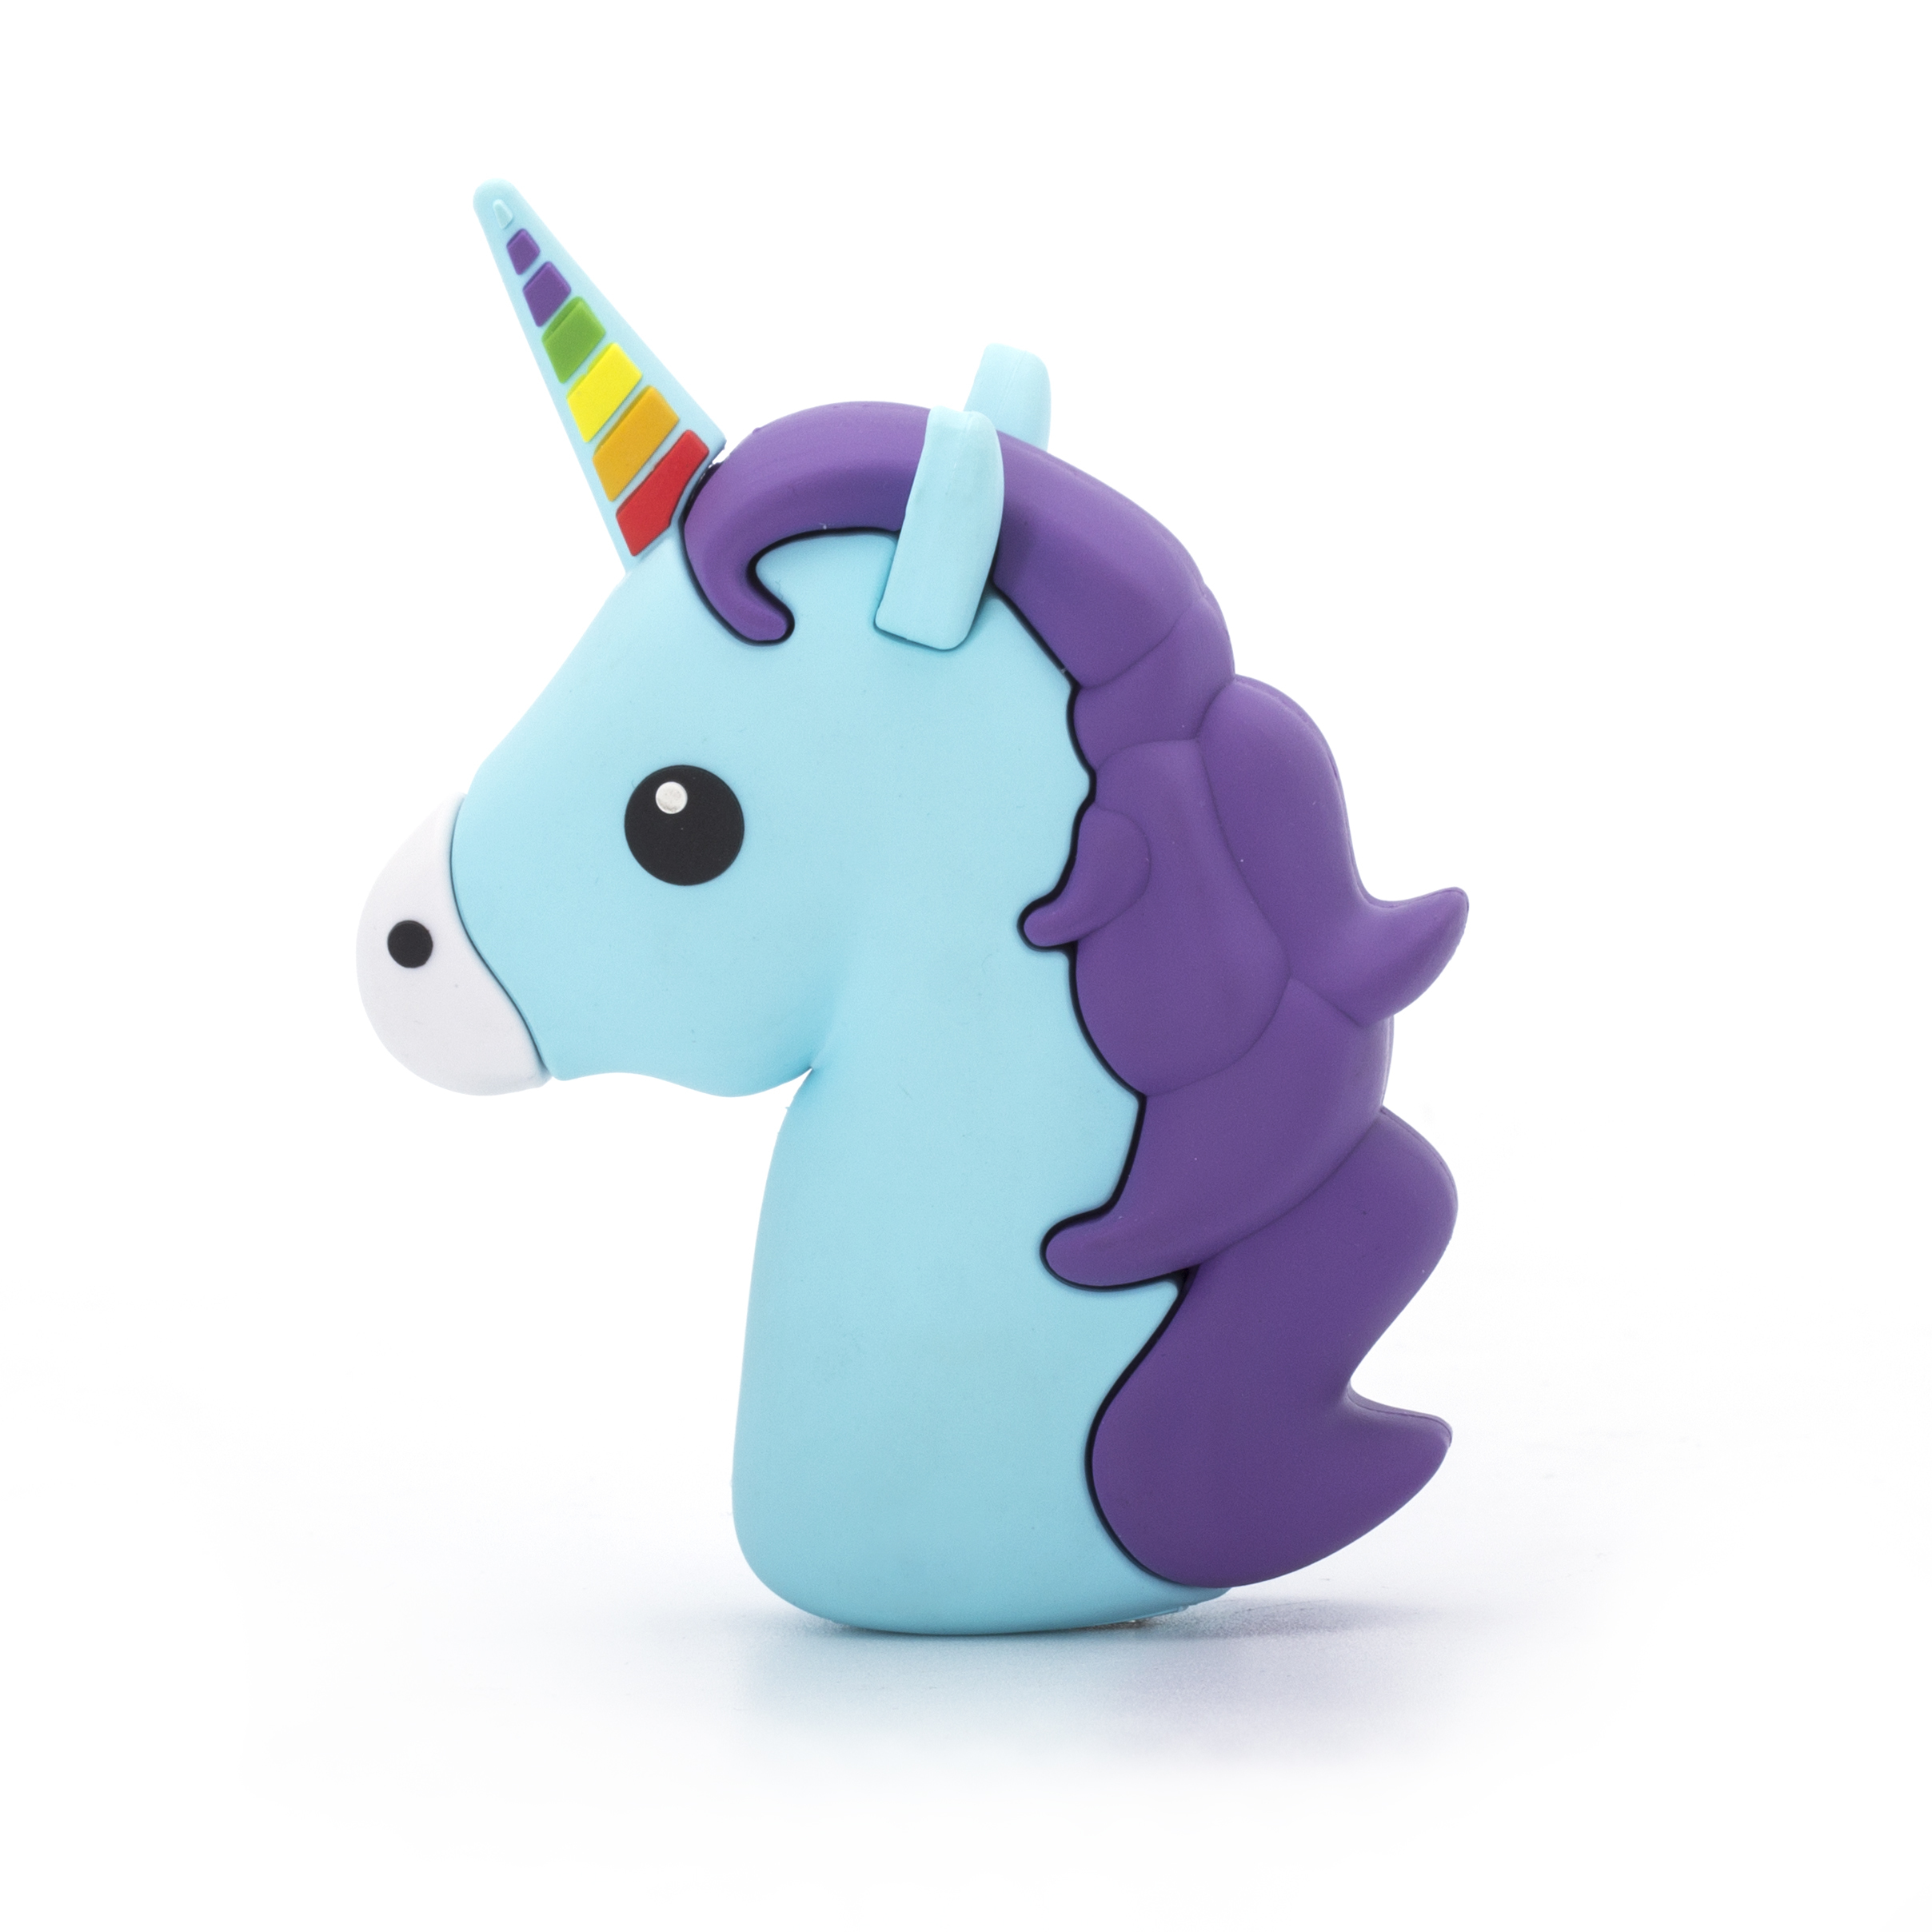 Thumbs Up Unicorn - Mehrfarbig - Universal - 2000 mAh - 5 V - 5 V - 90 mm